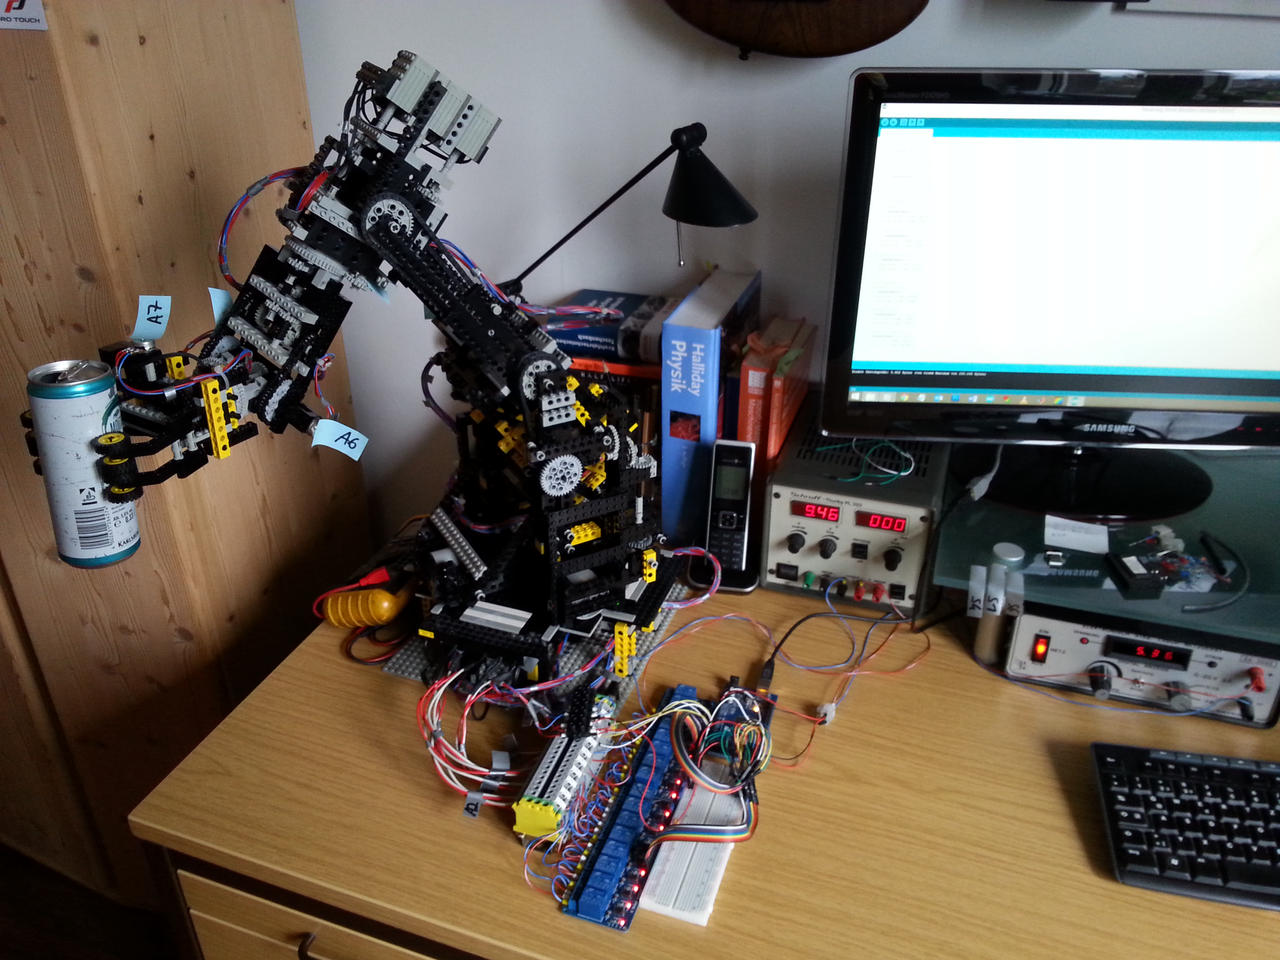 Arduino controlled axes lego robot by hausmann on deviantart